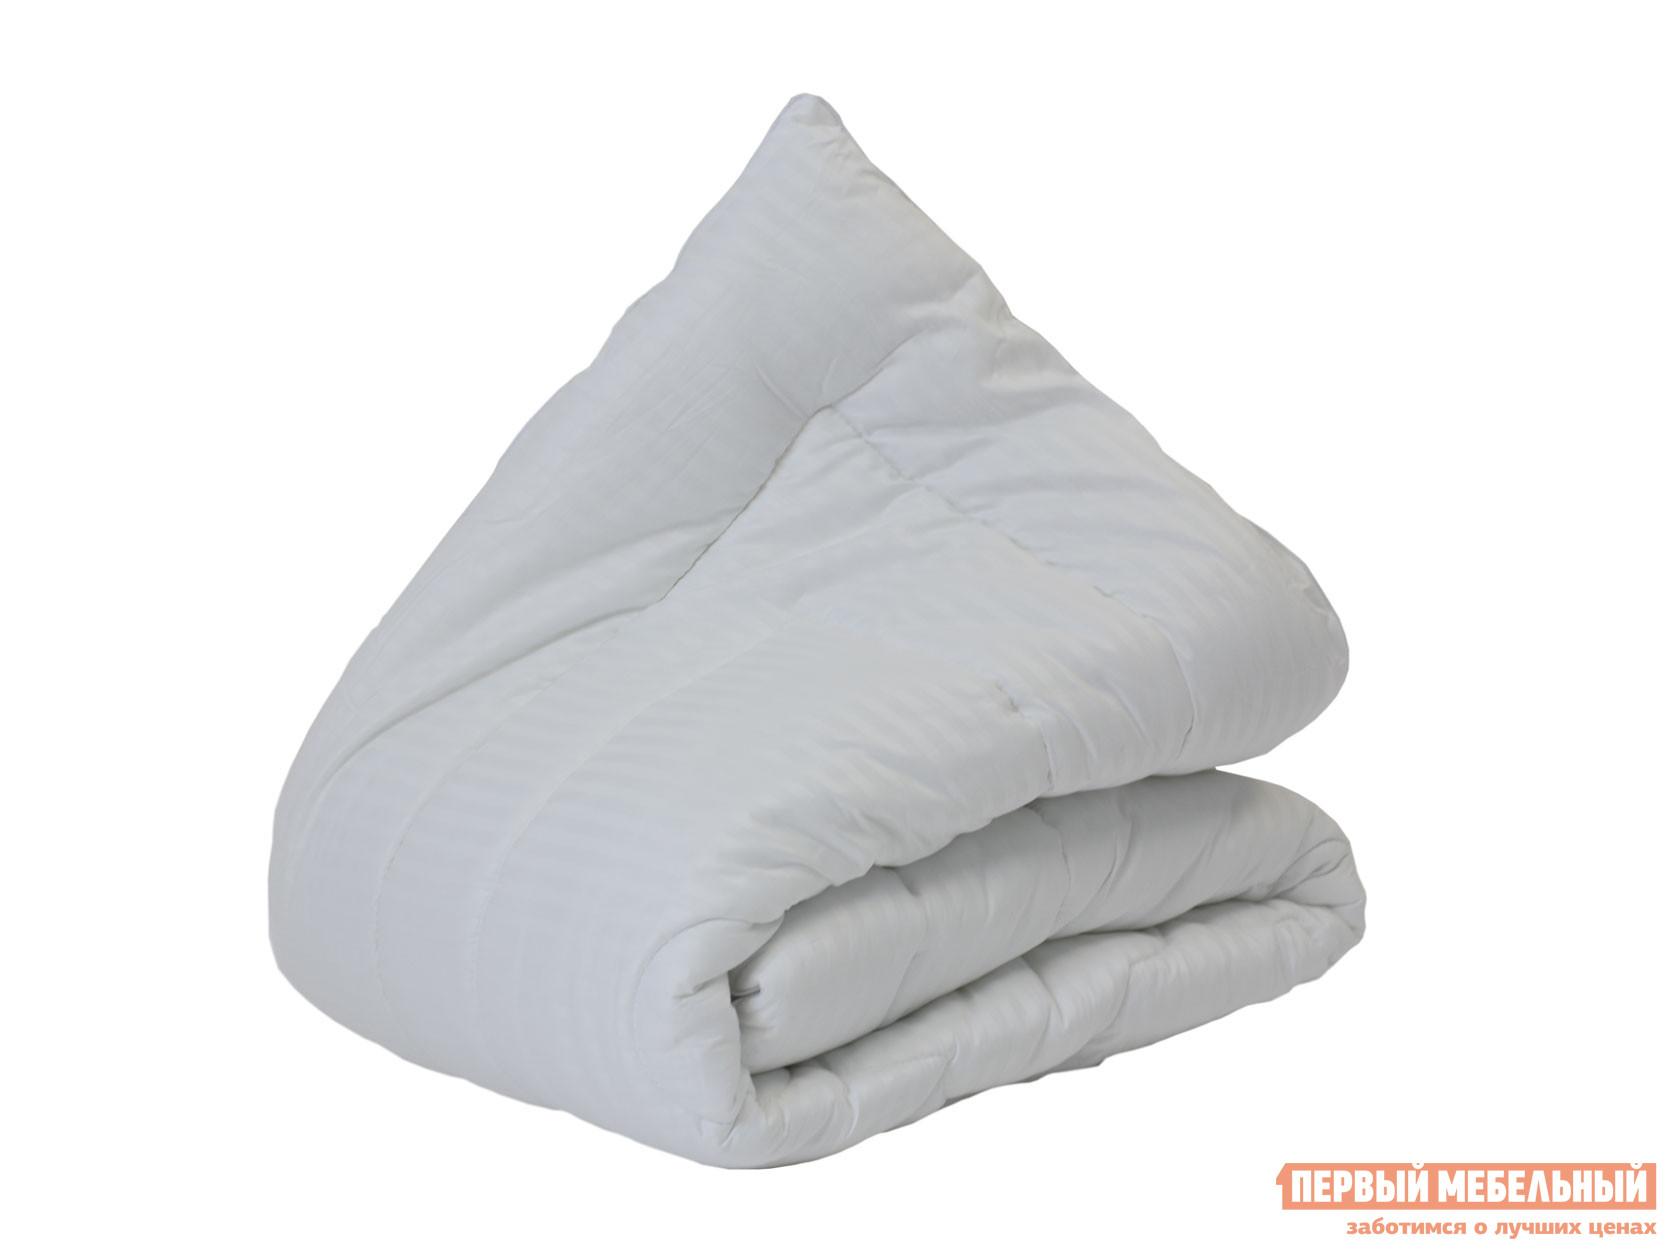 Одеяло Одеяло сатин/бамбуковое волокно 300 гр/м2 всесезонное Белый, 2000 х 2200 мм фото